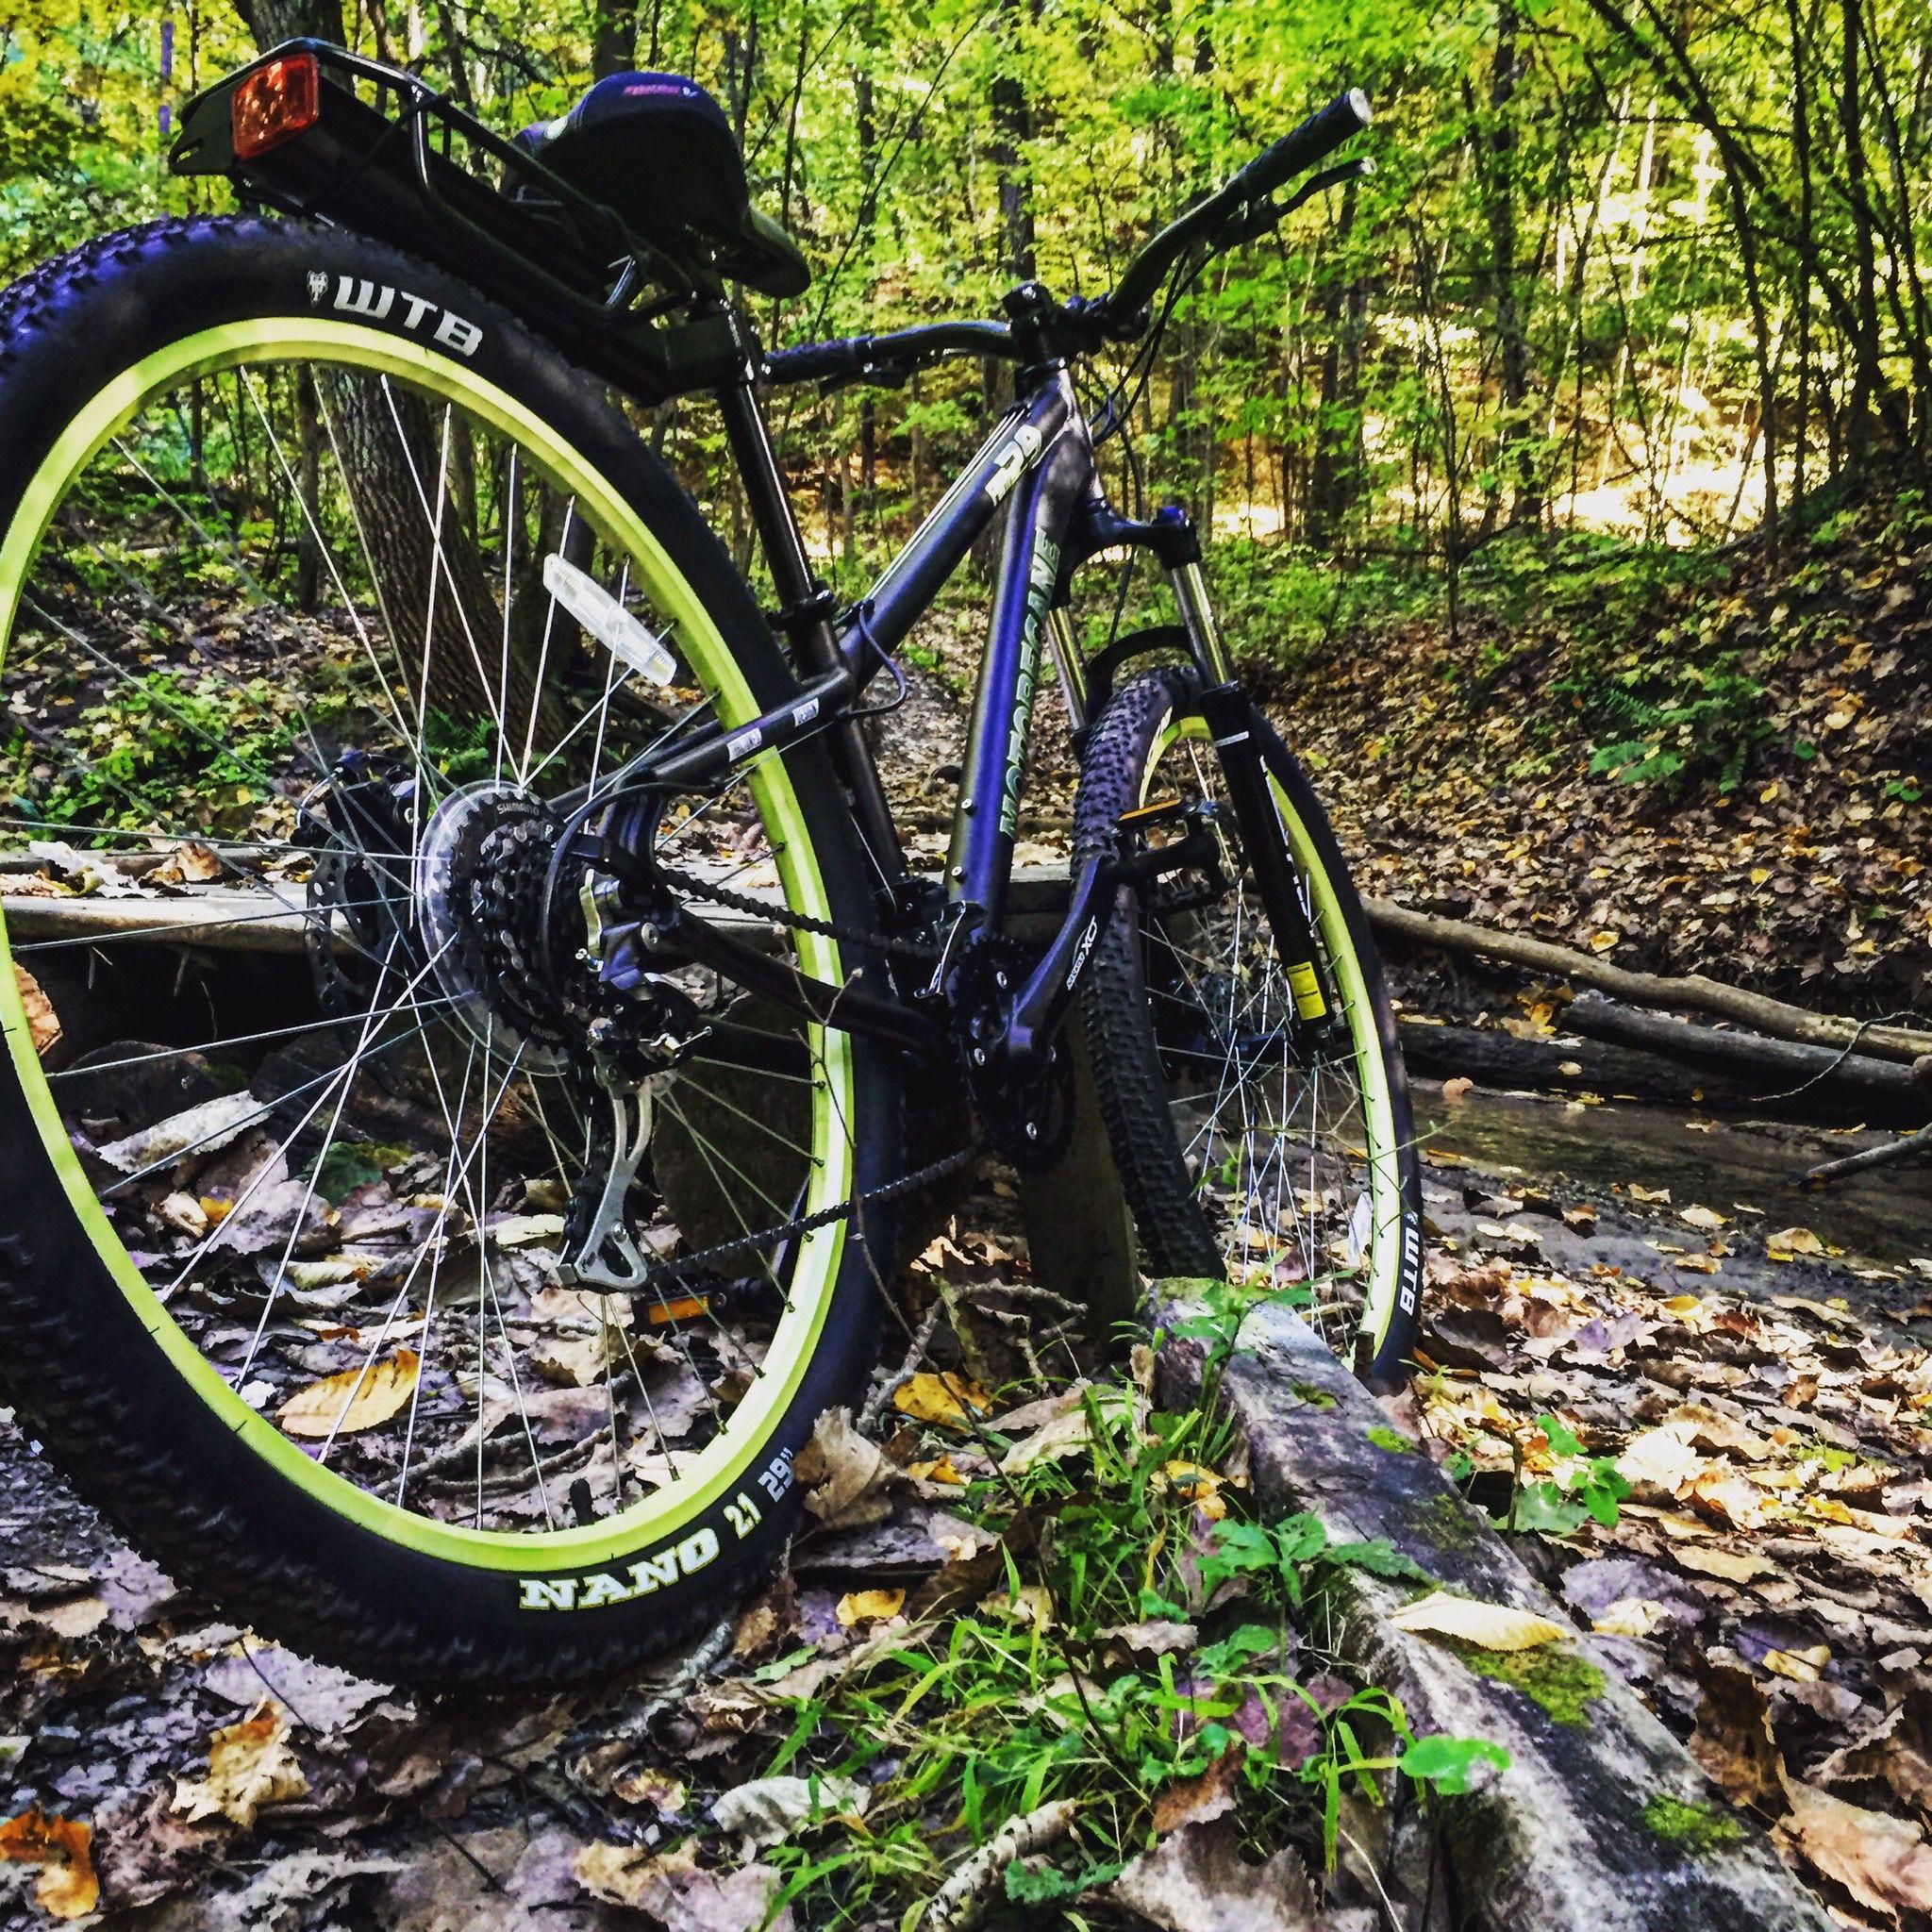 Motobecane Fantom29 Mountain Bike At Kinns Road Park Mountain